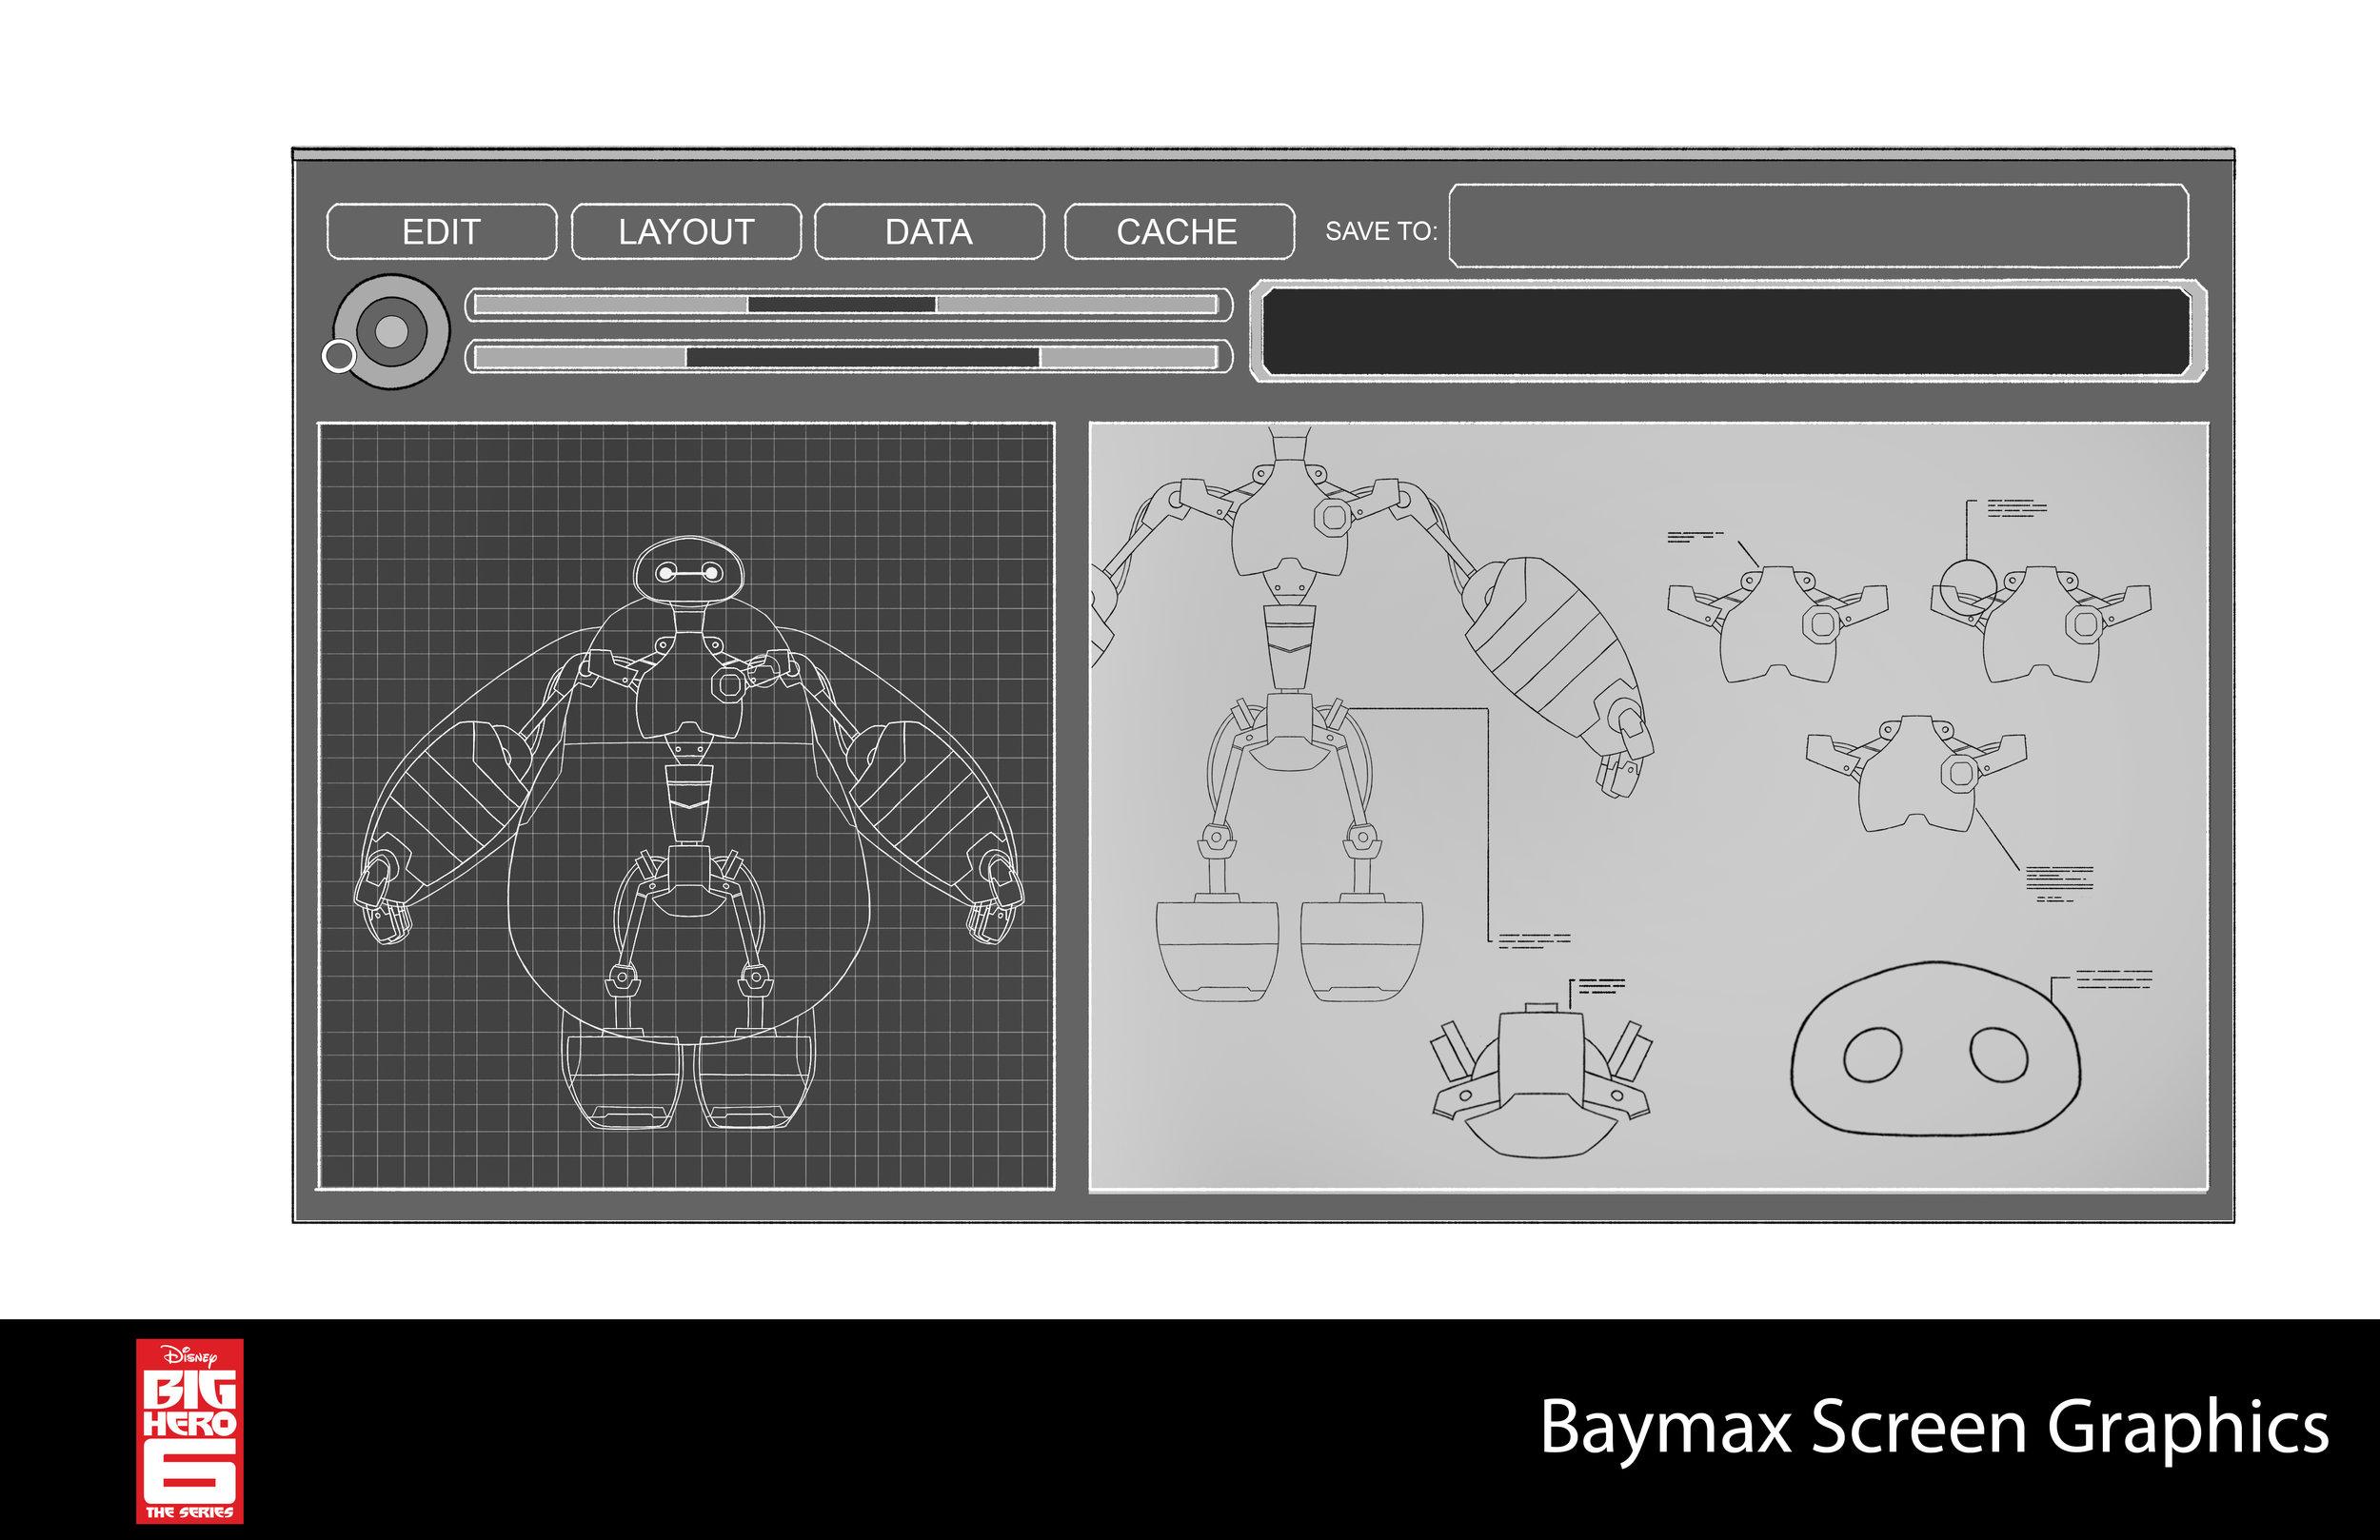 106_BaymaxComputerScreenGraphics_R_V01_BS.jpg